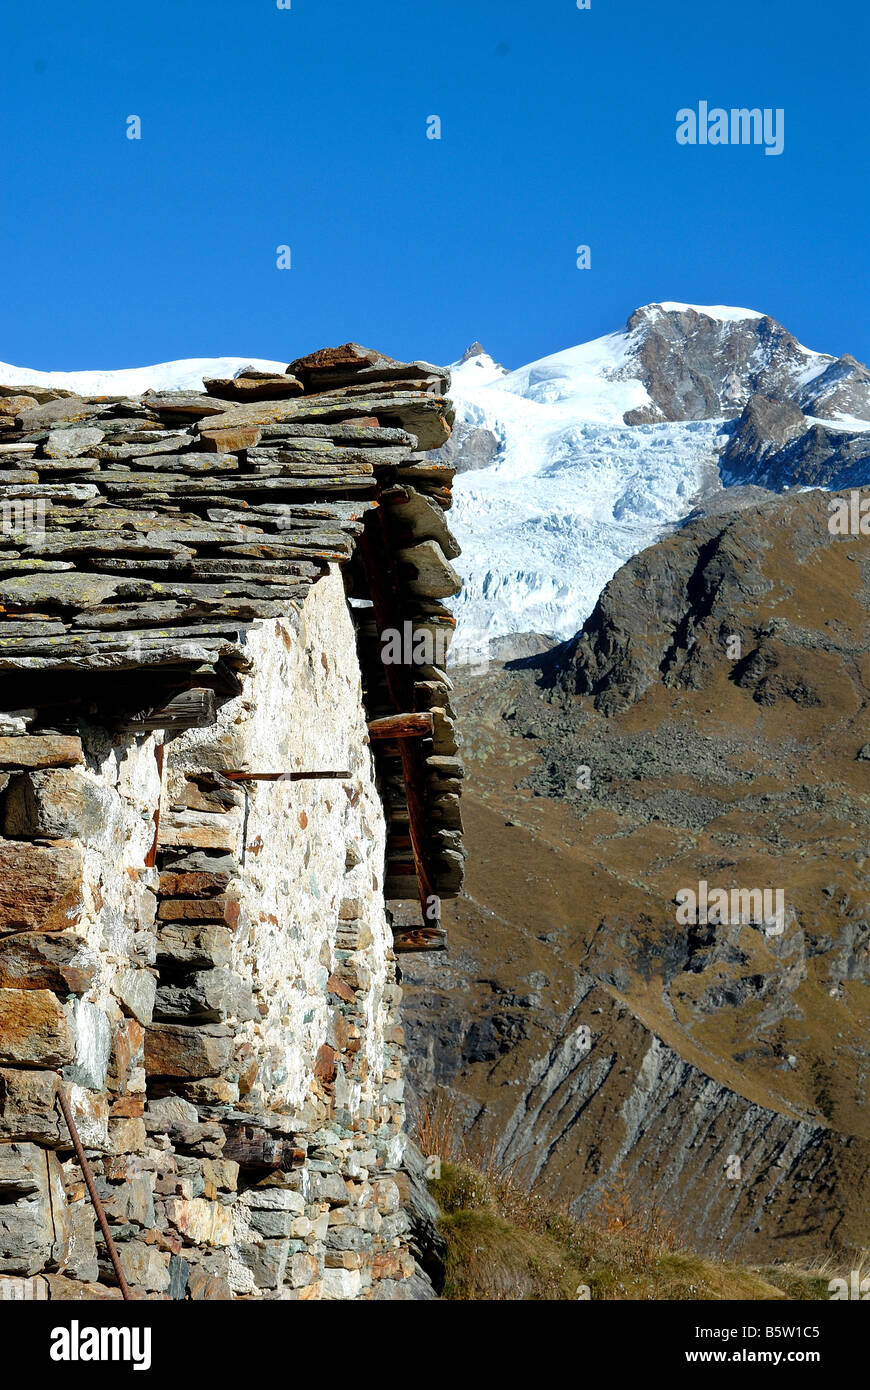 Alpe di Roos  Piramide Vincent  Monte Rosa  Valle di Gressoney  Valle d'Aosta  Italy Stock Photo